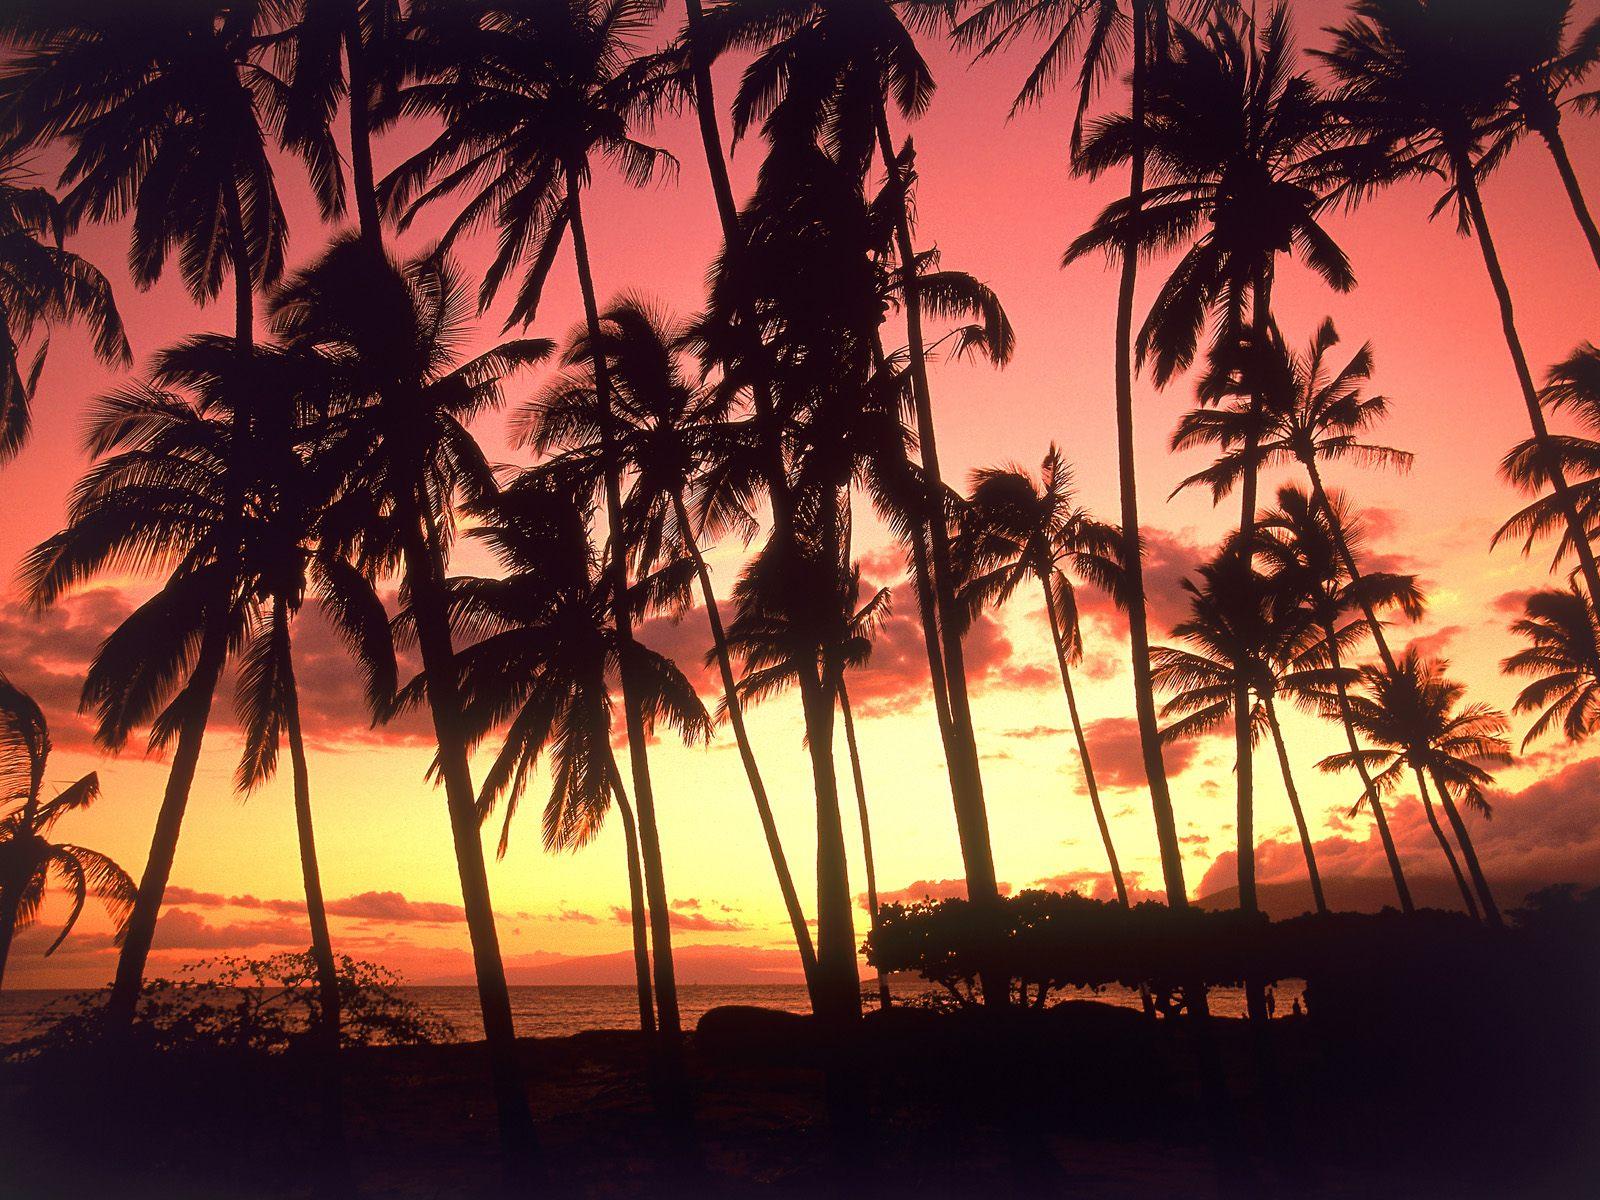 http://1.bp.blogspot.com/-pI3LlQ2Jc_s/UElenCH3jHI/AAAAAAAAAaI/60Ozftc8M8k/s1600/Hawaii-Sunset%2B.jpg